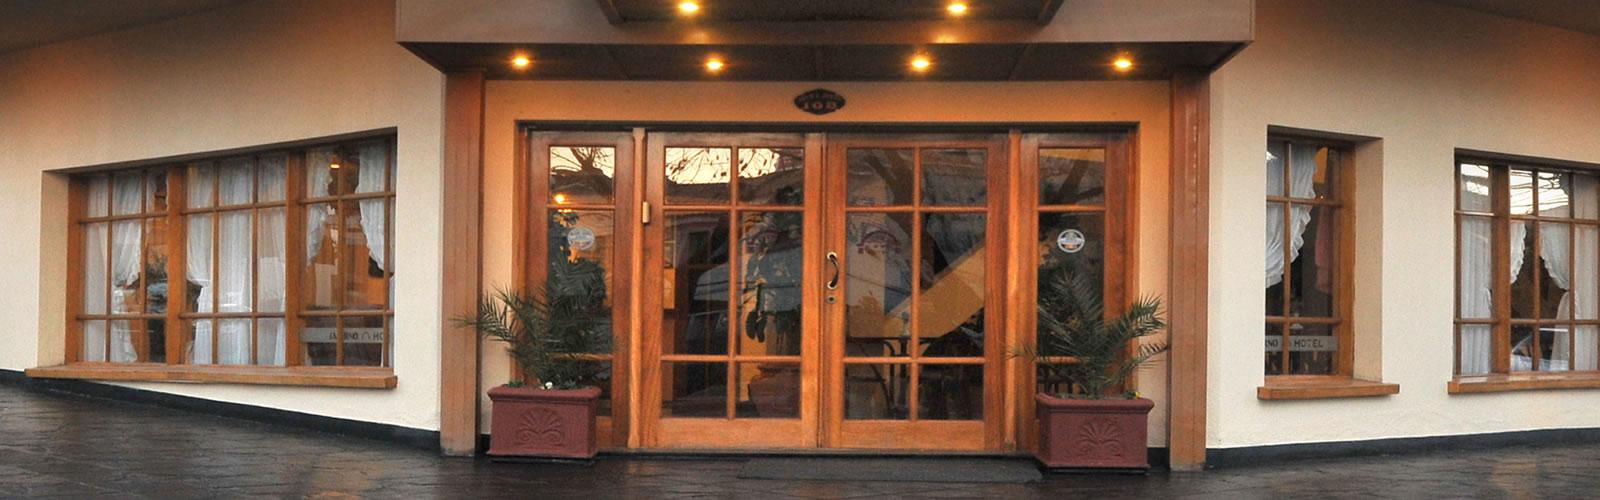 Ingreso al Hotel Salerno